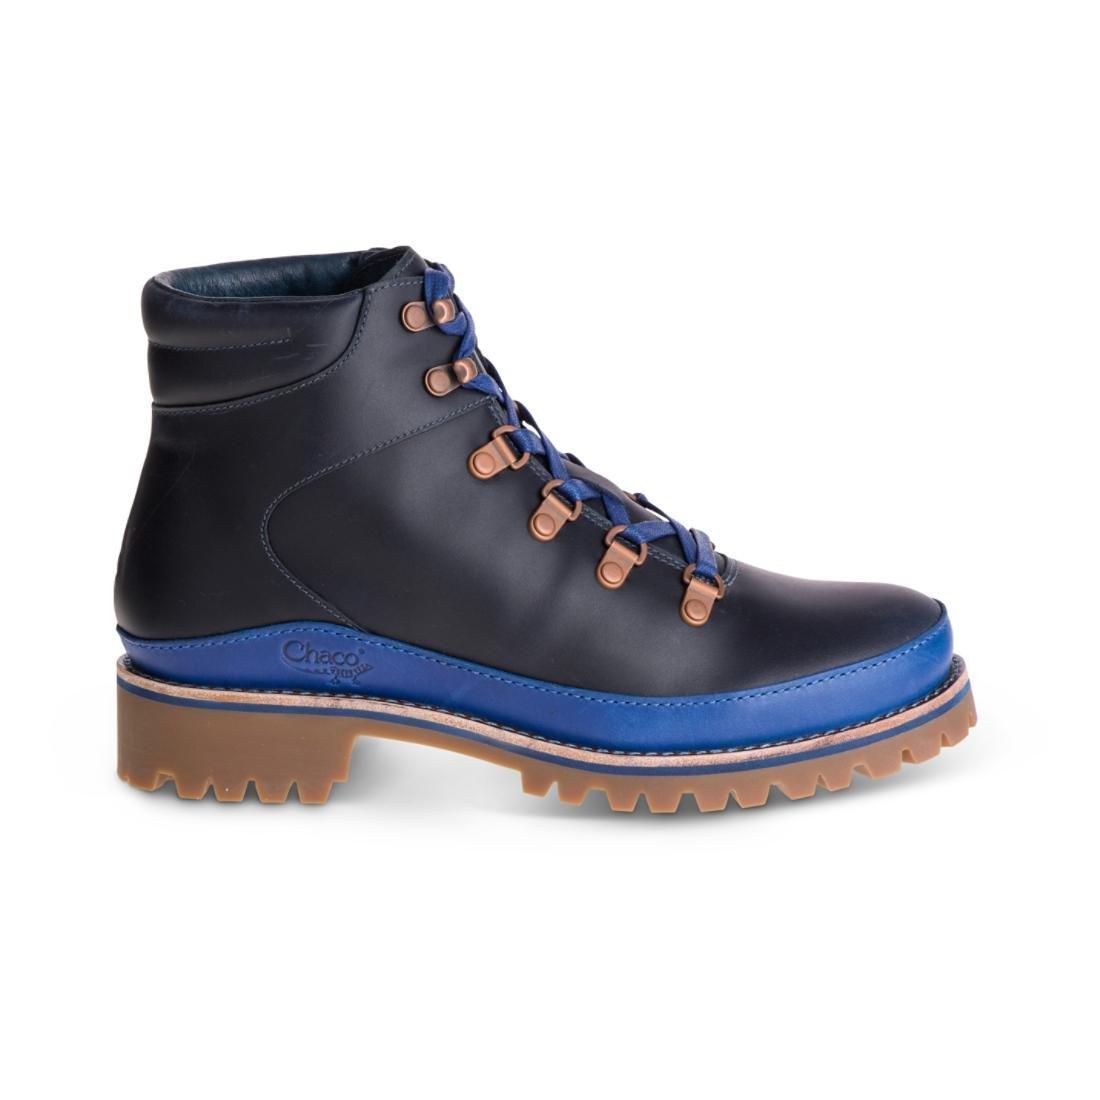 Chaco Women's Fields-W Hiking Boot B01LYF0KPI 8 B(M) US|Blues